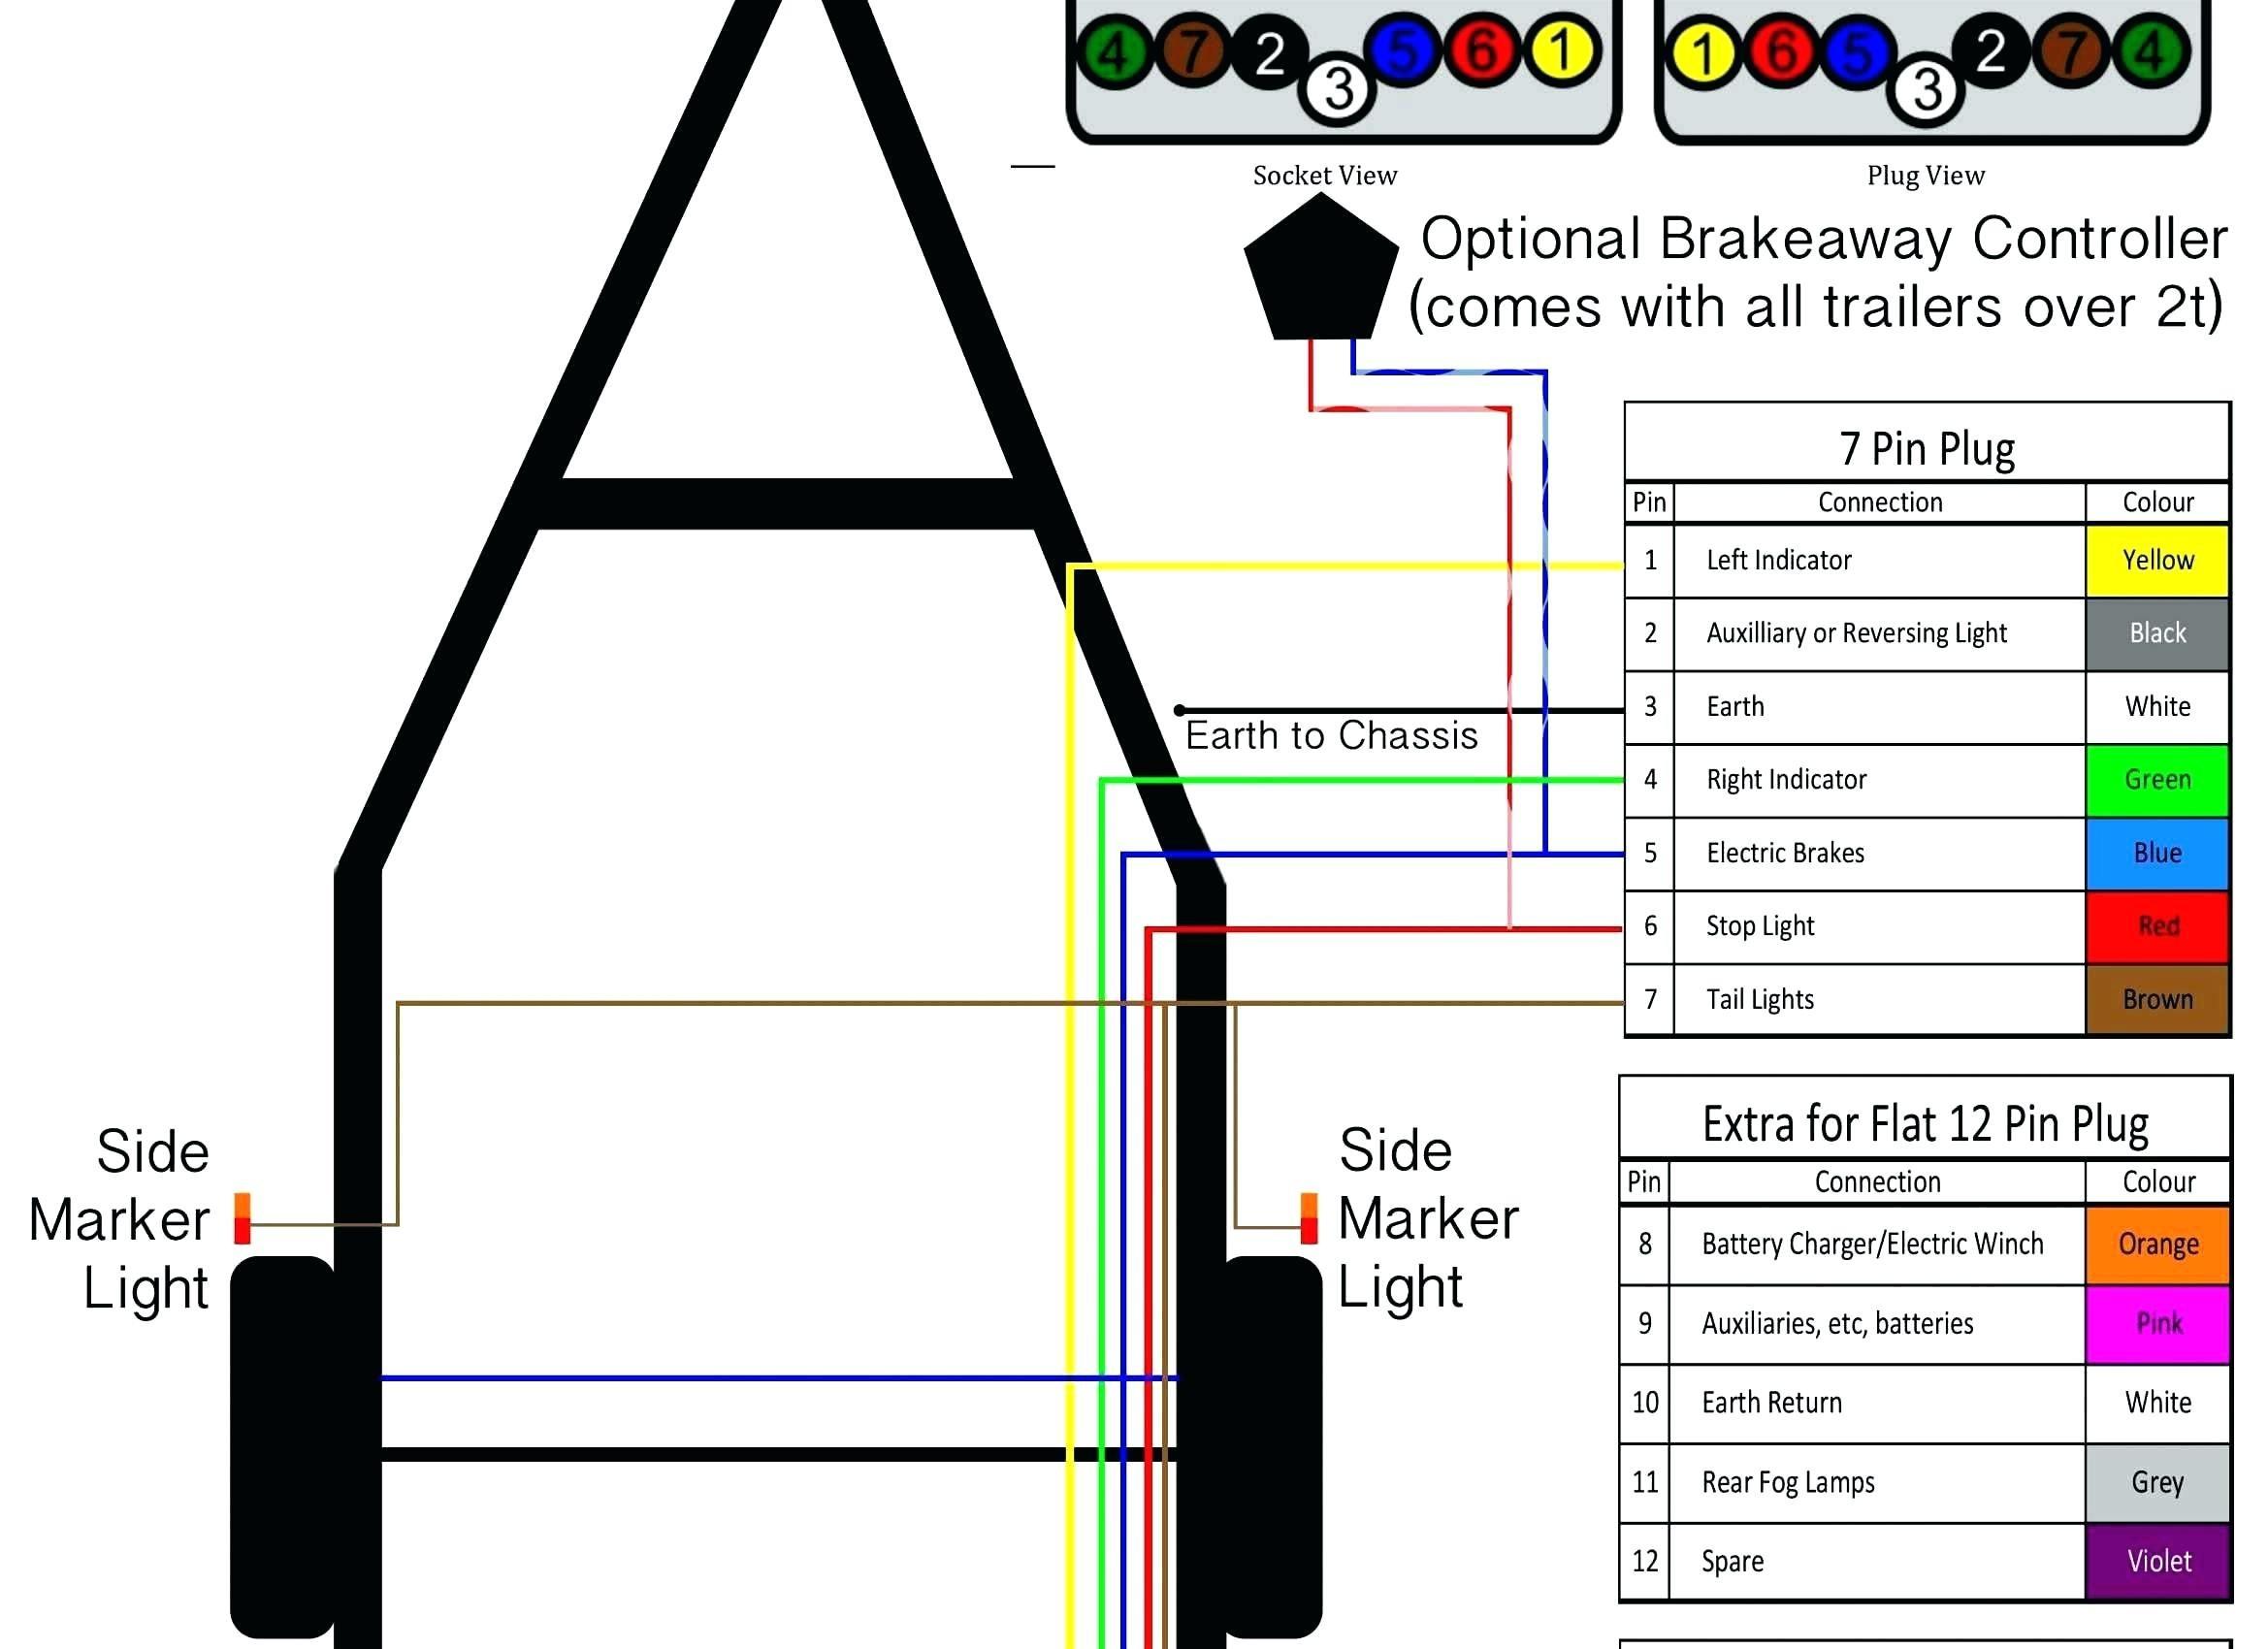 Universal Trailer Wiring Diagram Color Code Fresh 6 Wire Trailer Wiring Diagram Fresh 6 Wire Trailer Plug Wiring